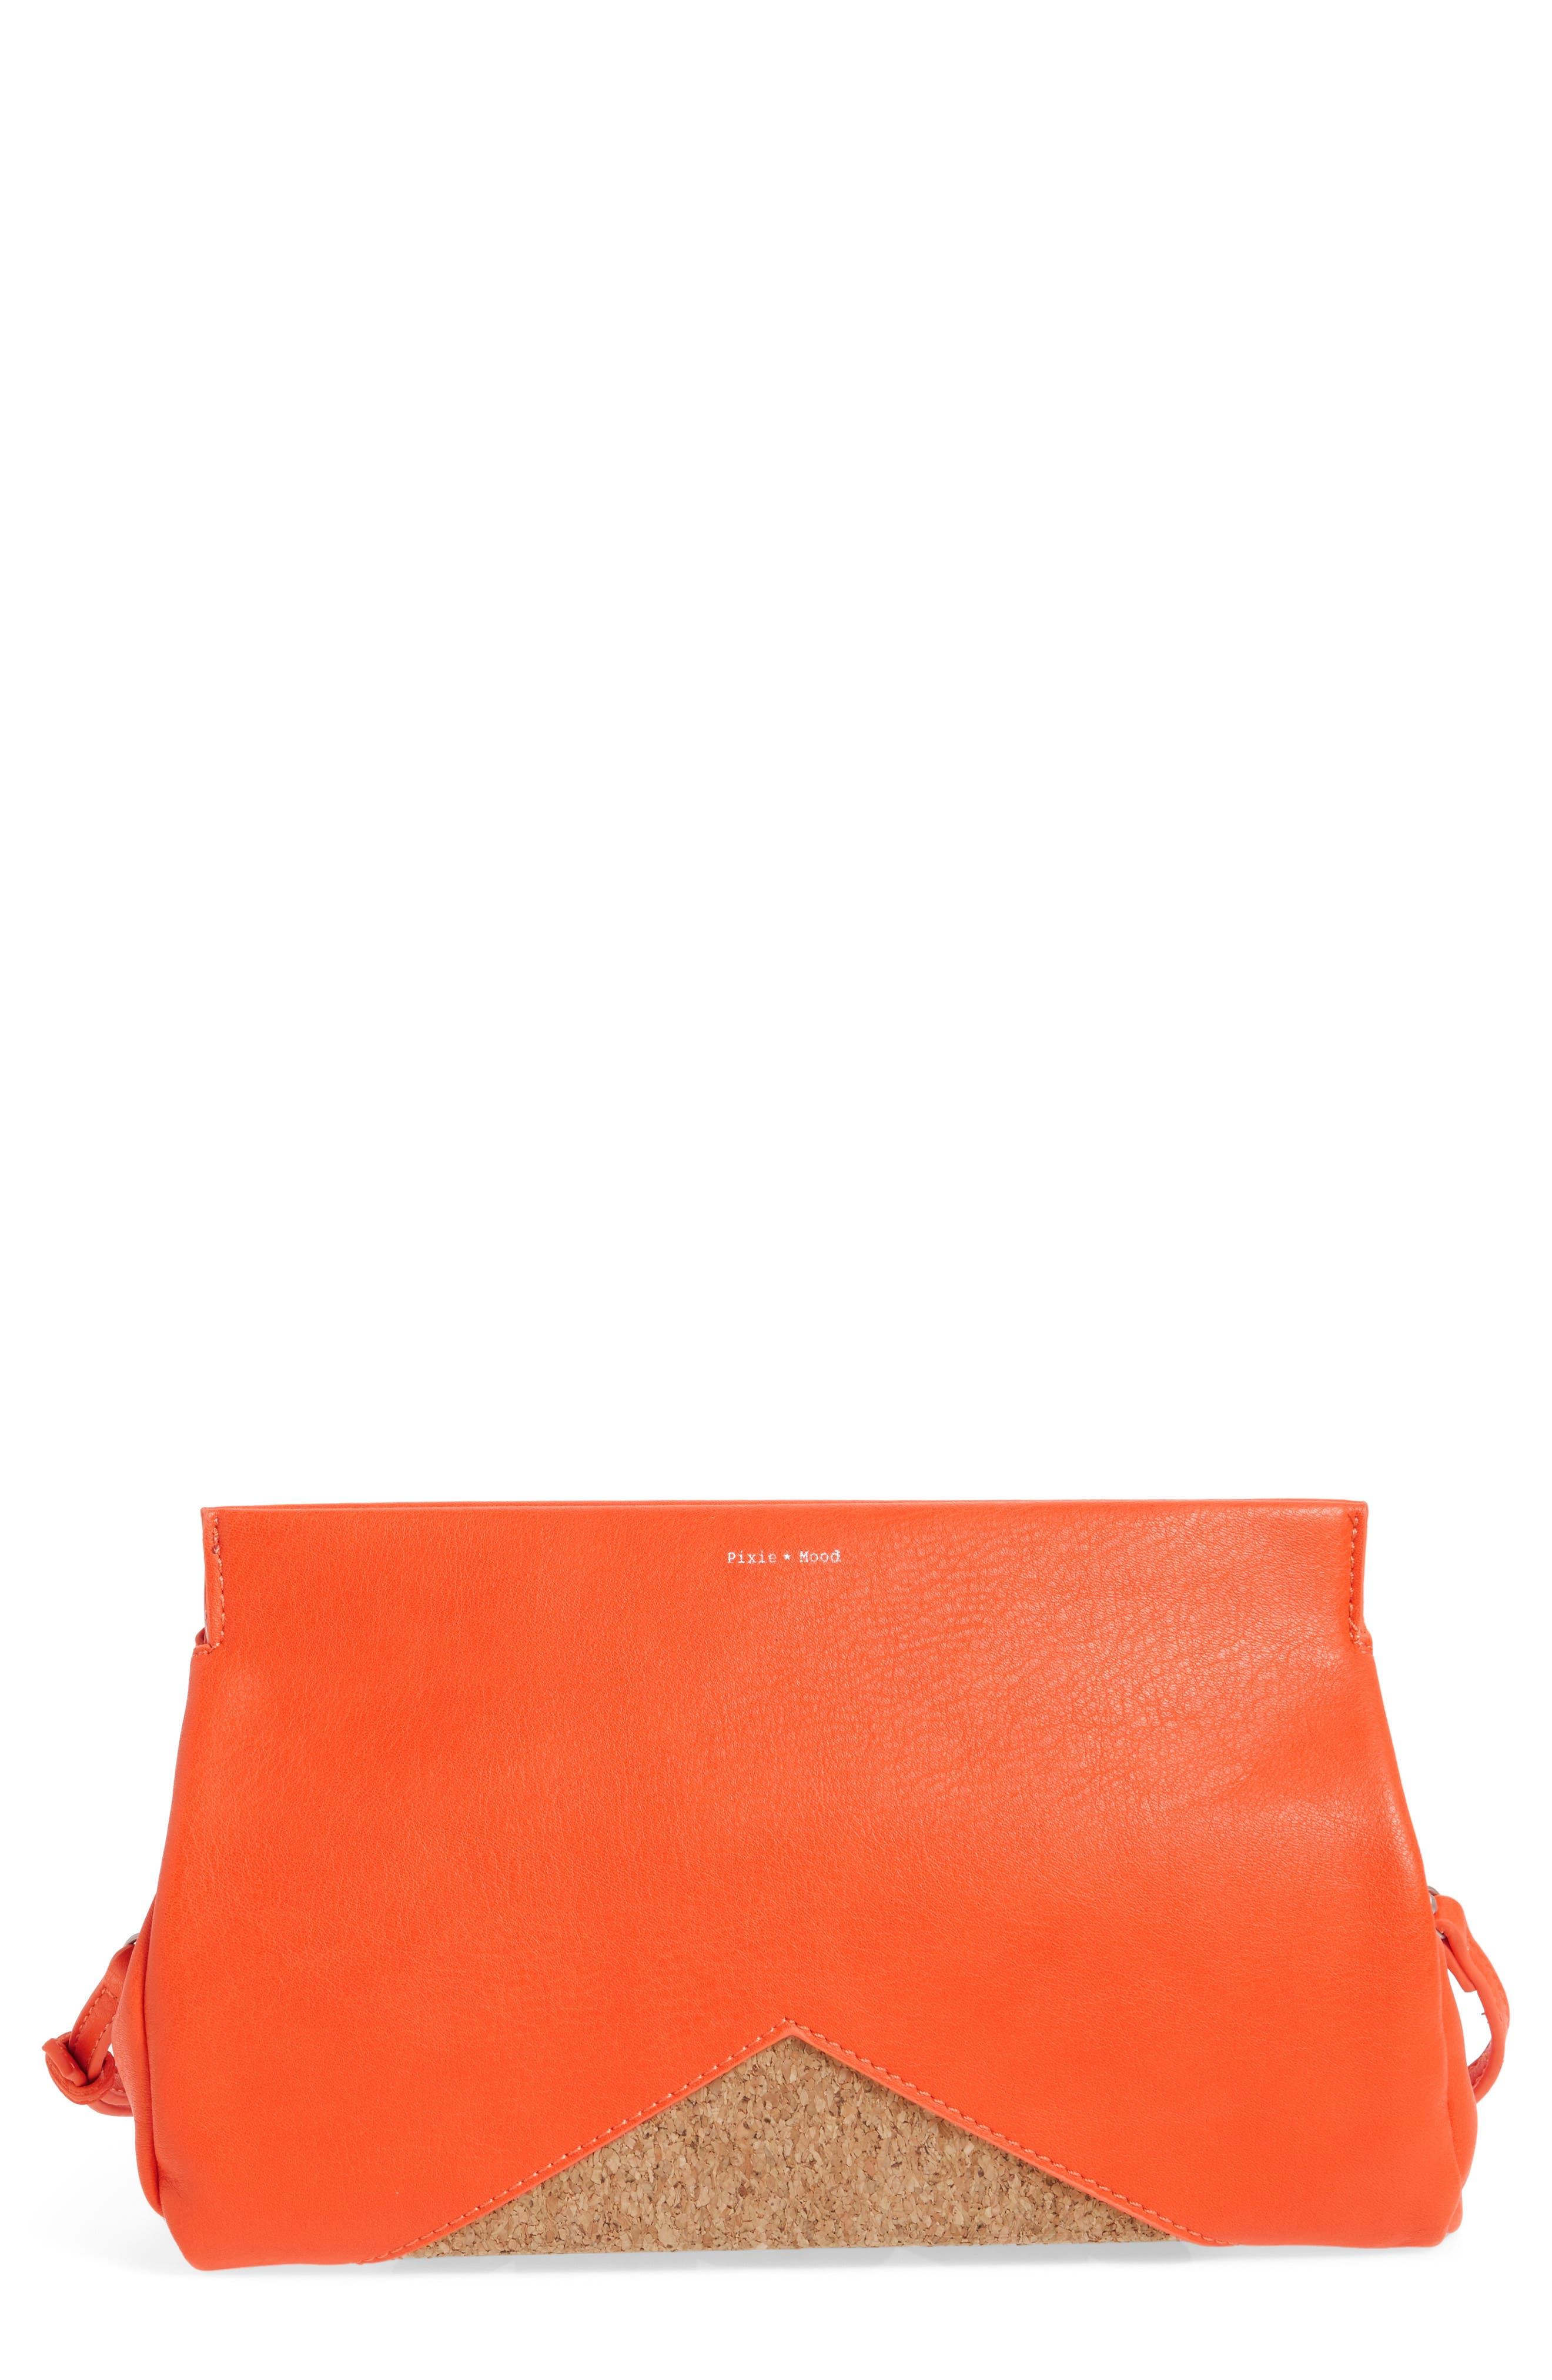 Pixie Mood Margaret Faux Leather Clutch